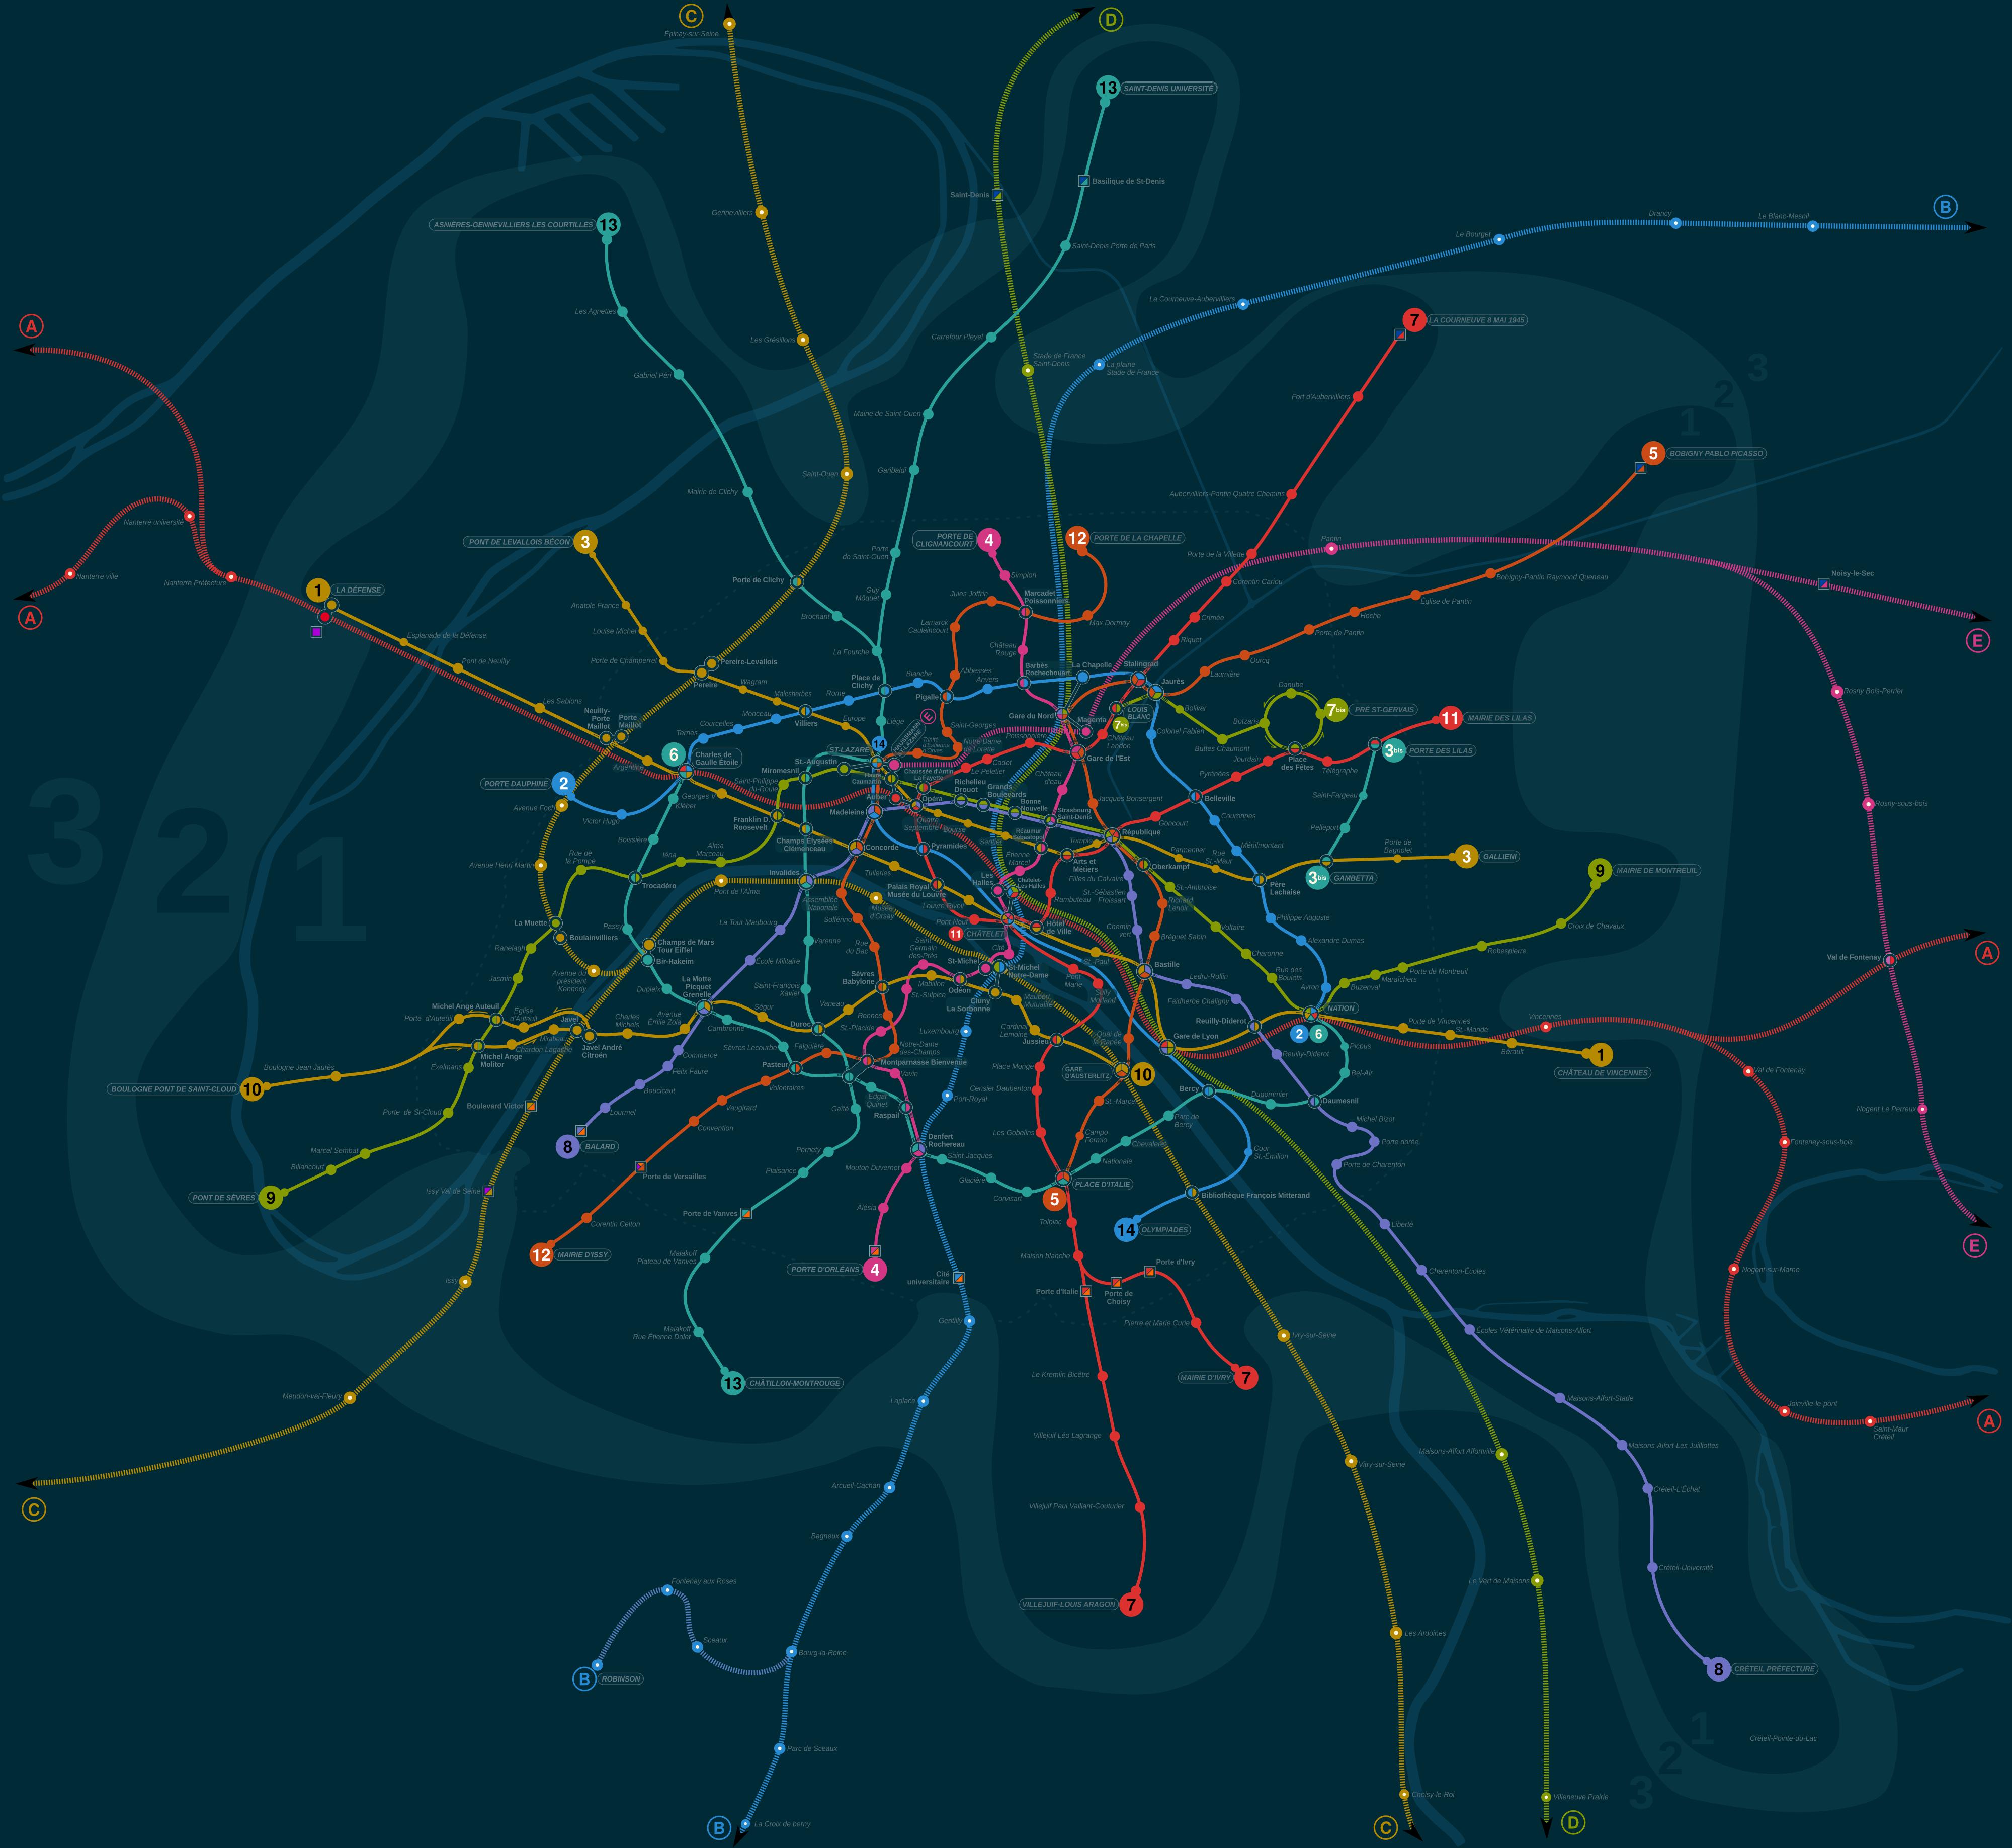 jeekajoo links carte golocalise du mtro parisien png image 4000 3674 pixels